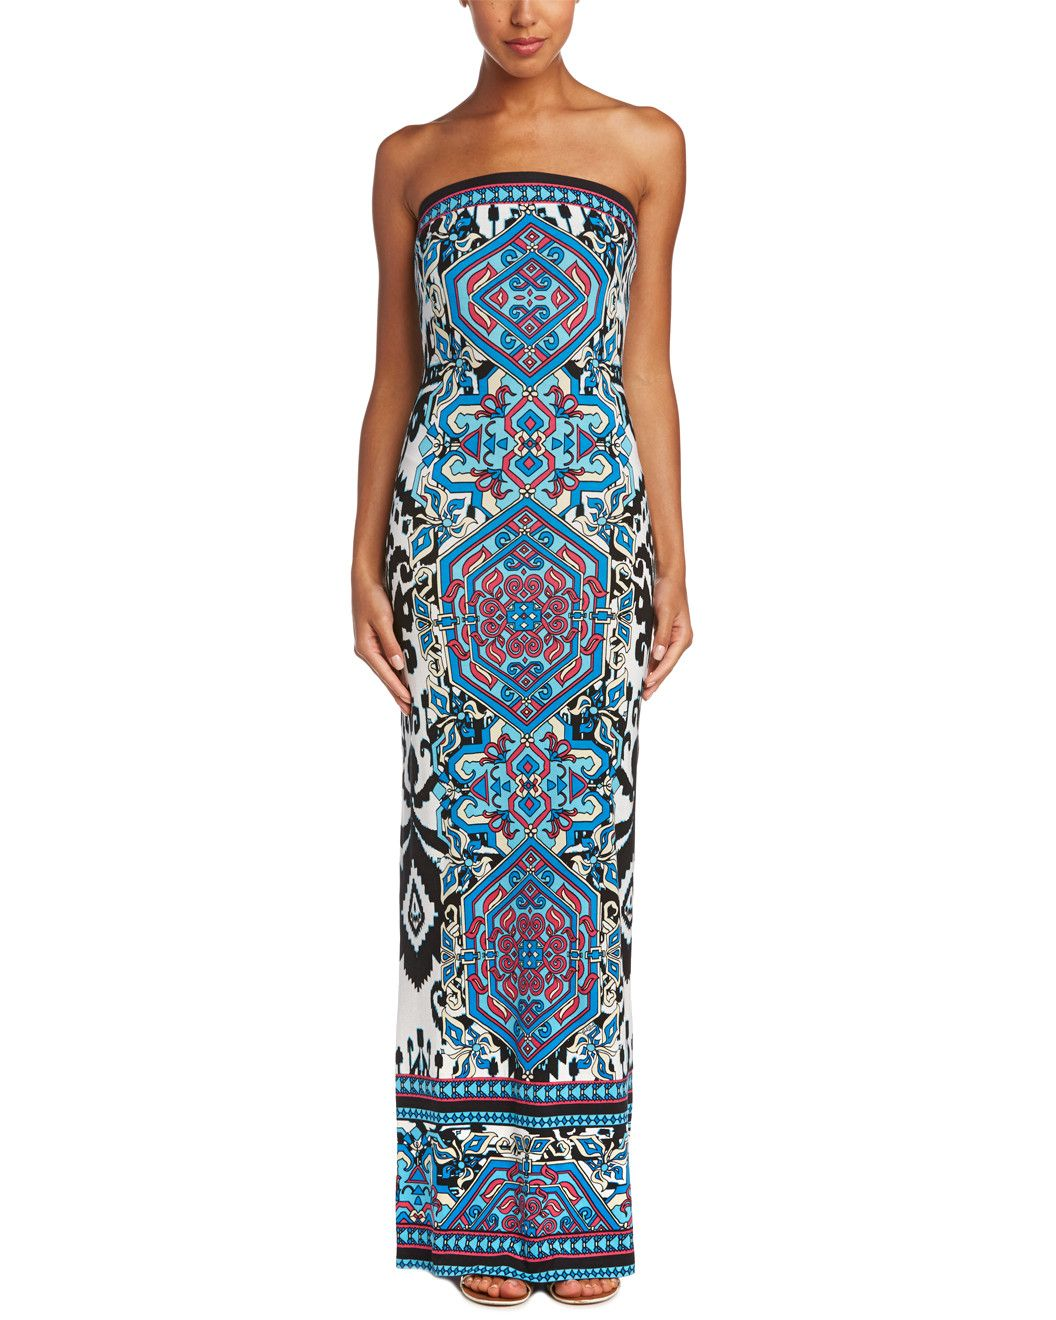 spotted this hale bob tube dress on rue la la. shop (quickly